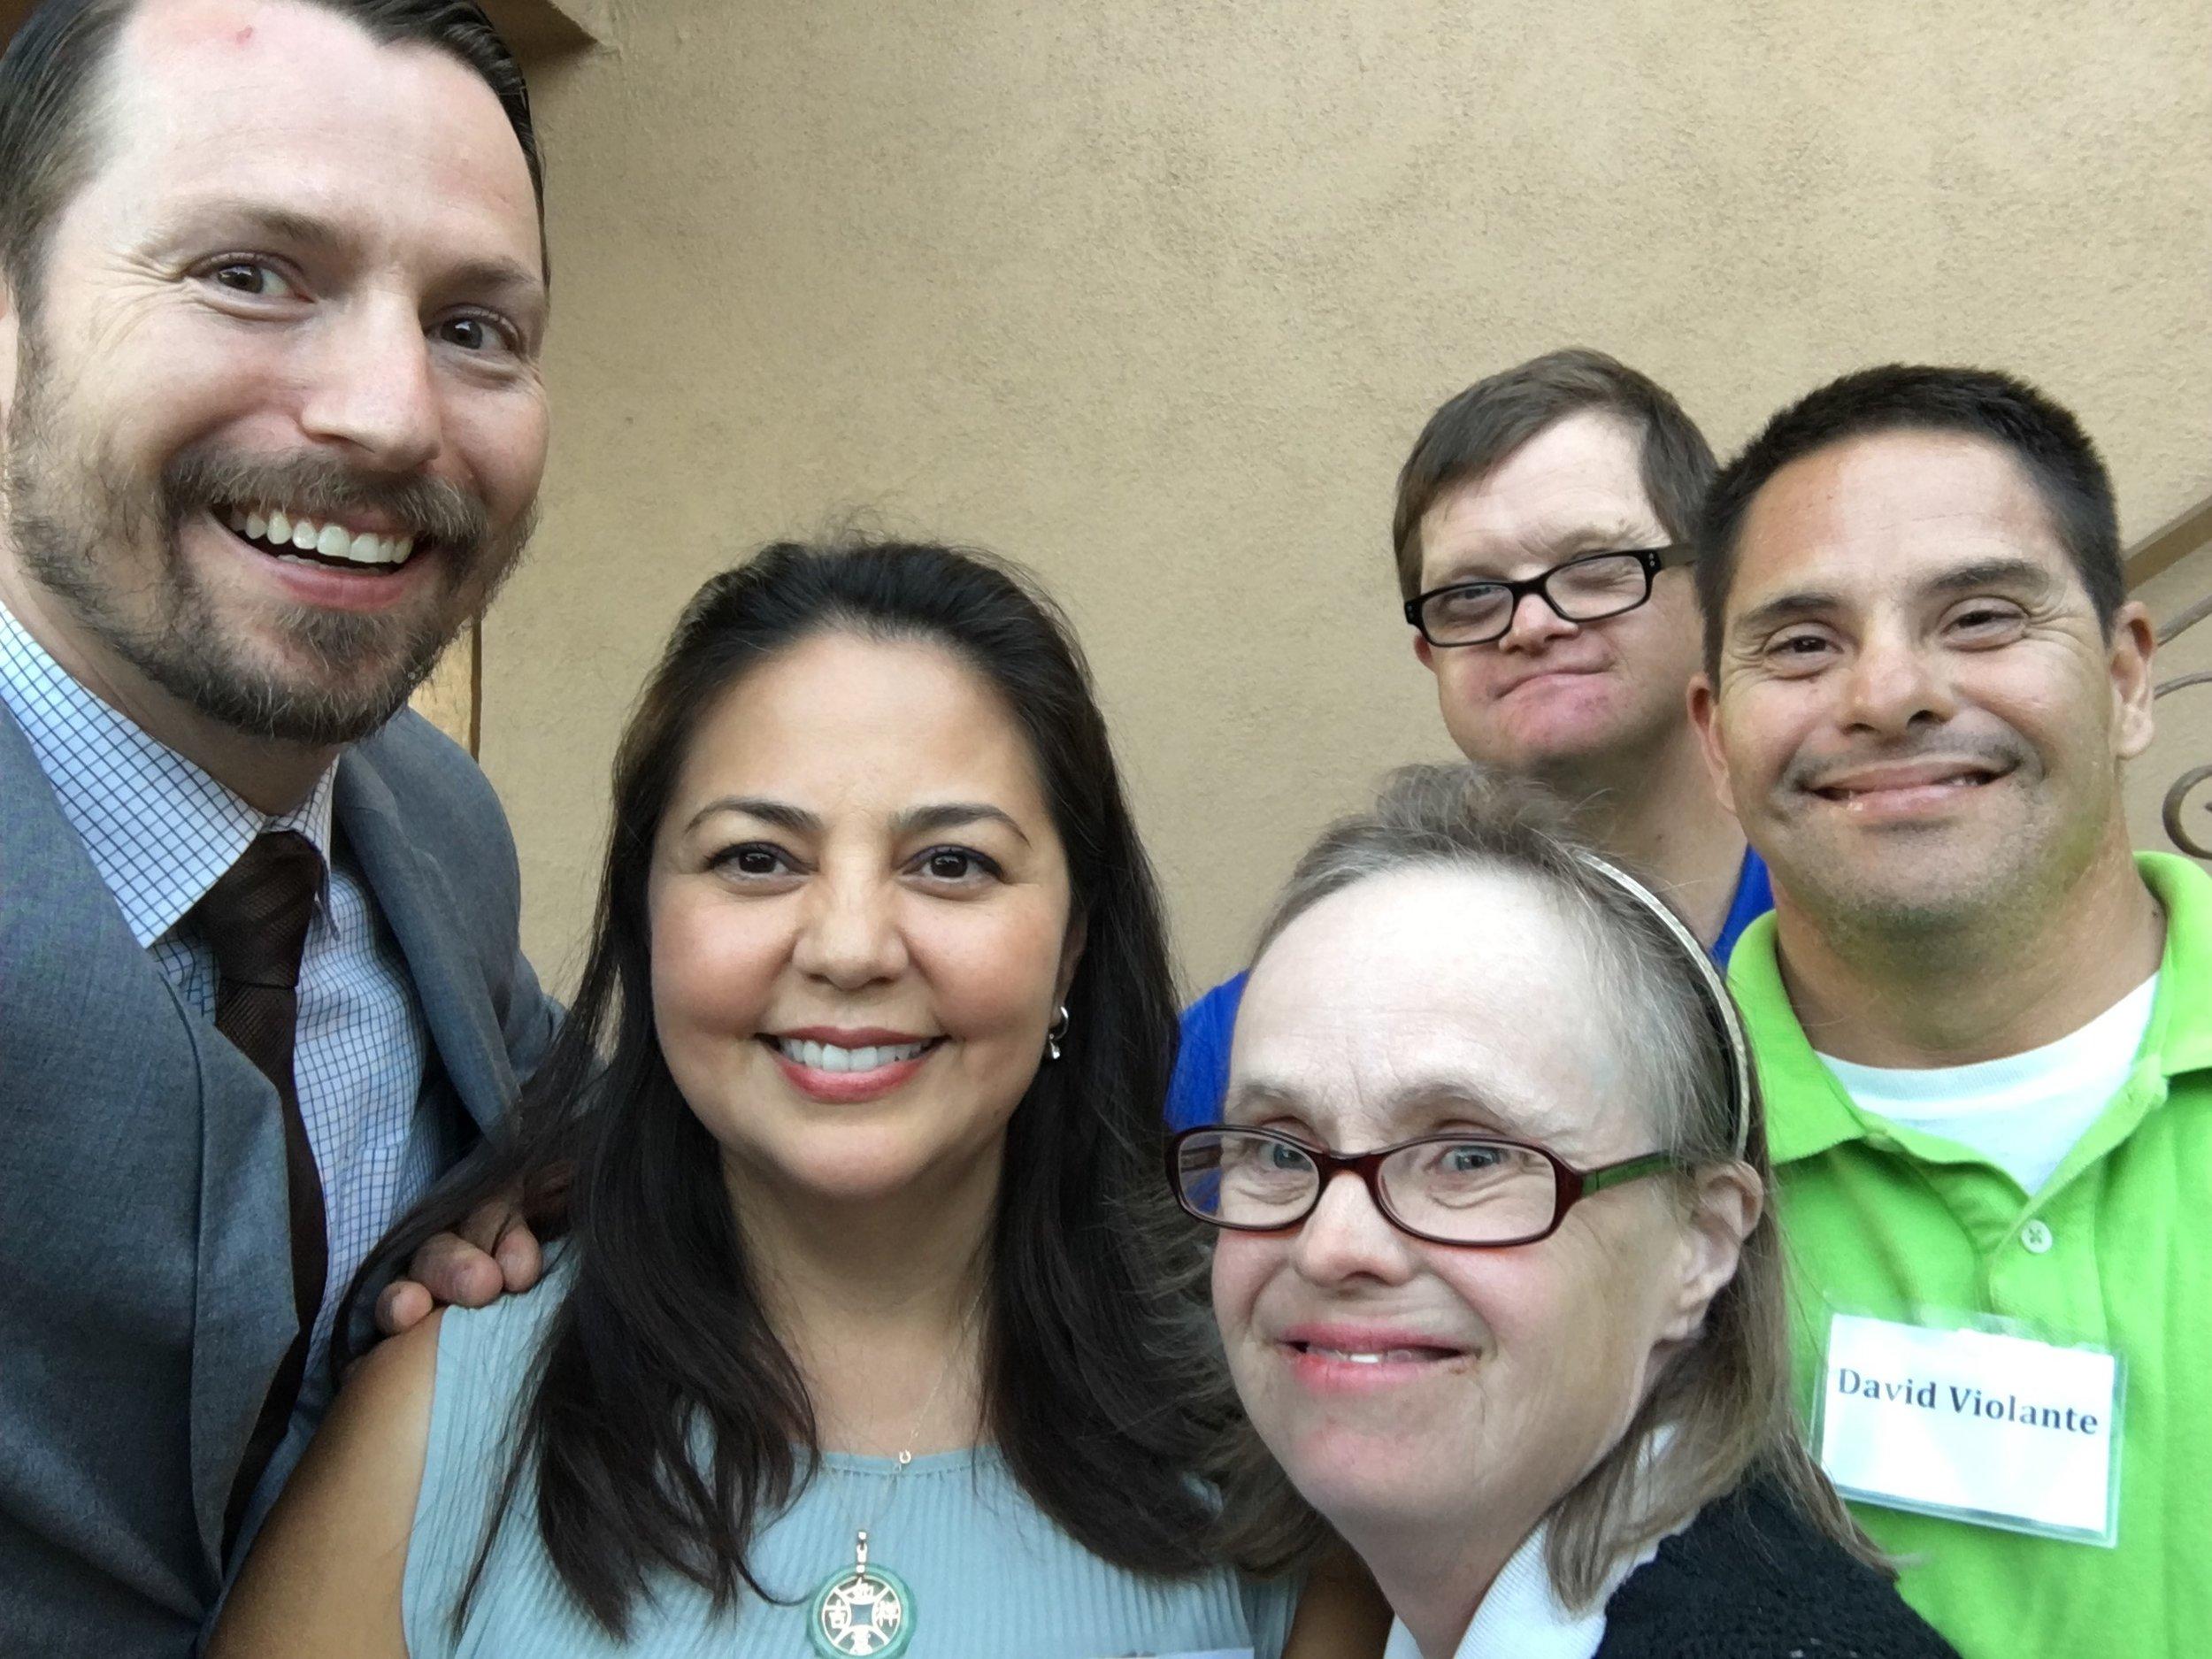 HOPE staff Ian Nevarez, HRC staff Vivian Galaviz, and new residents Jody, Thomas and David.